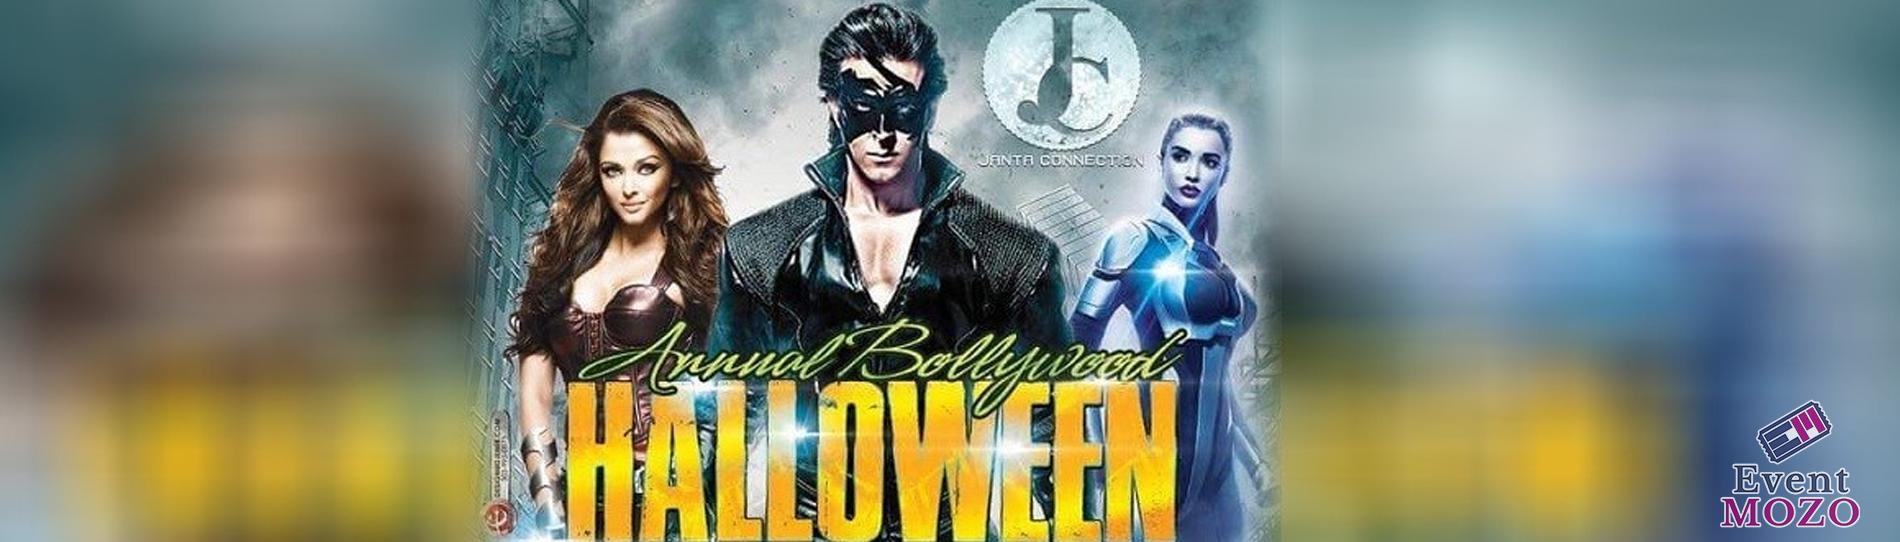 EventMozo Annual Bollywood Halloween Party San Jose